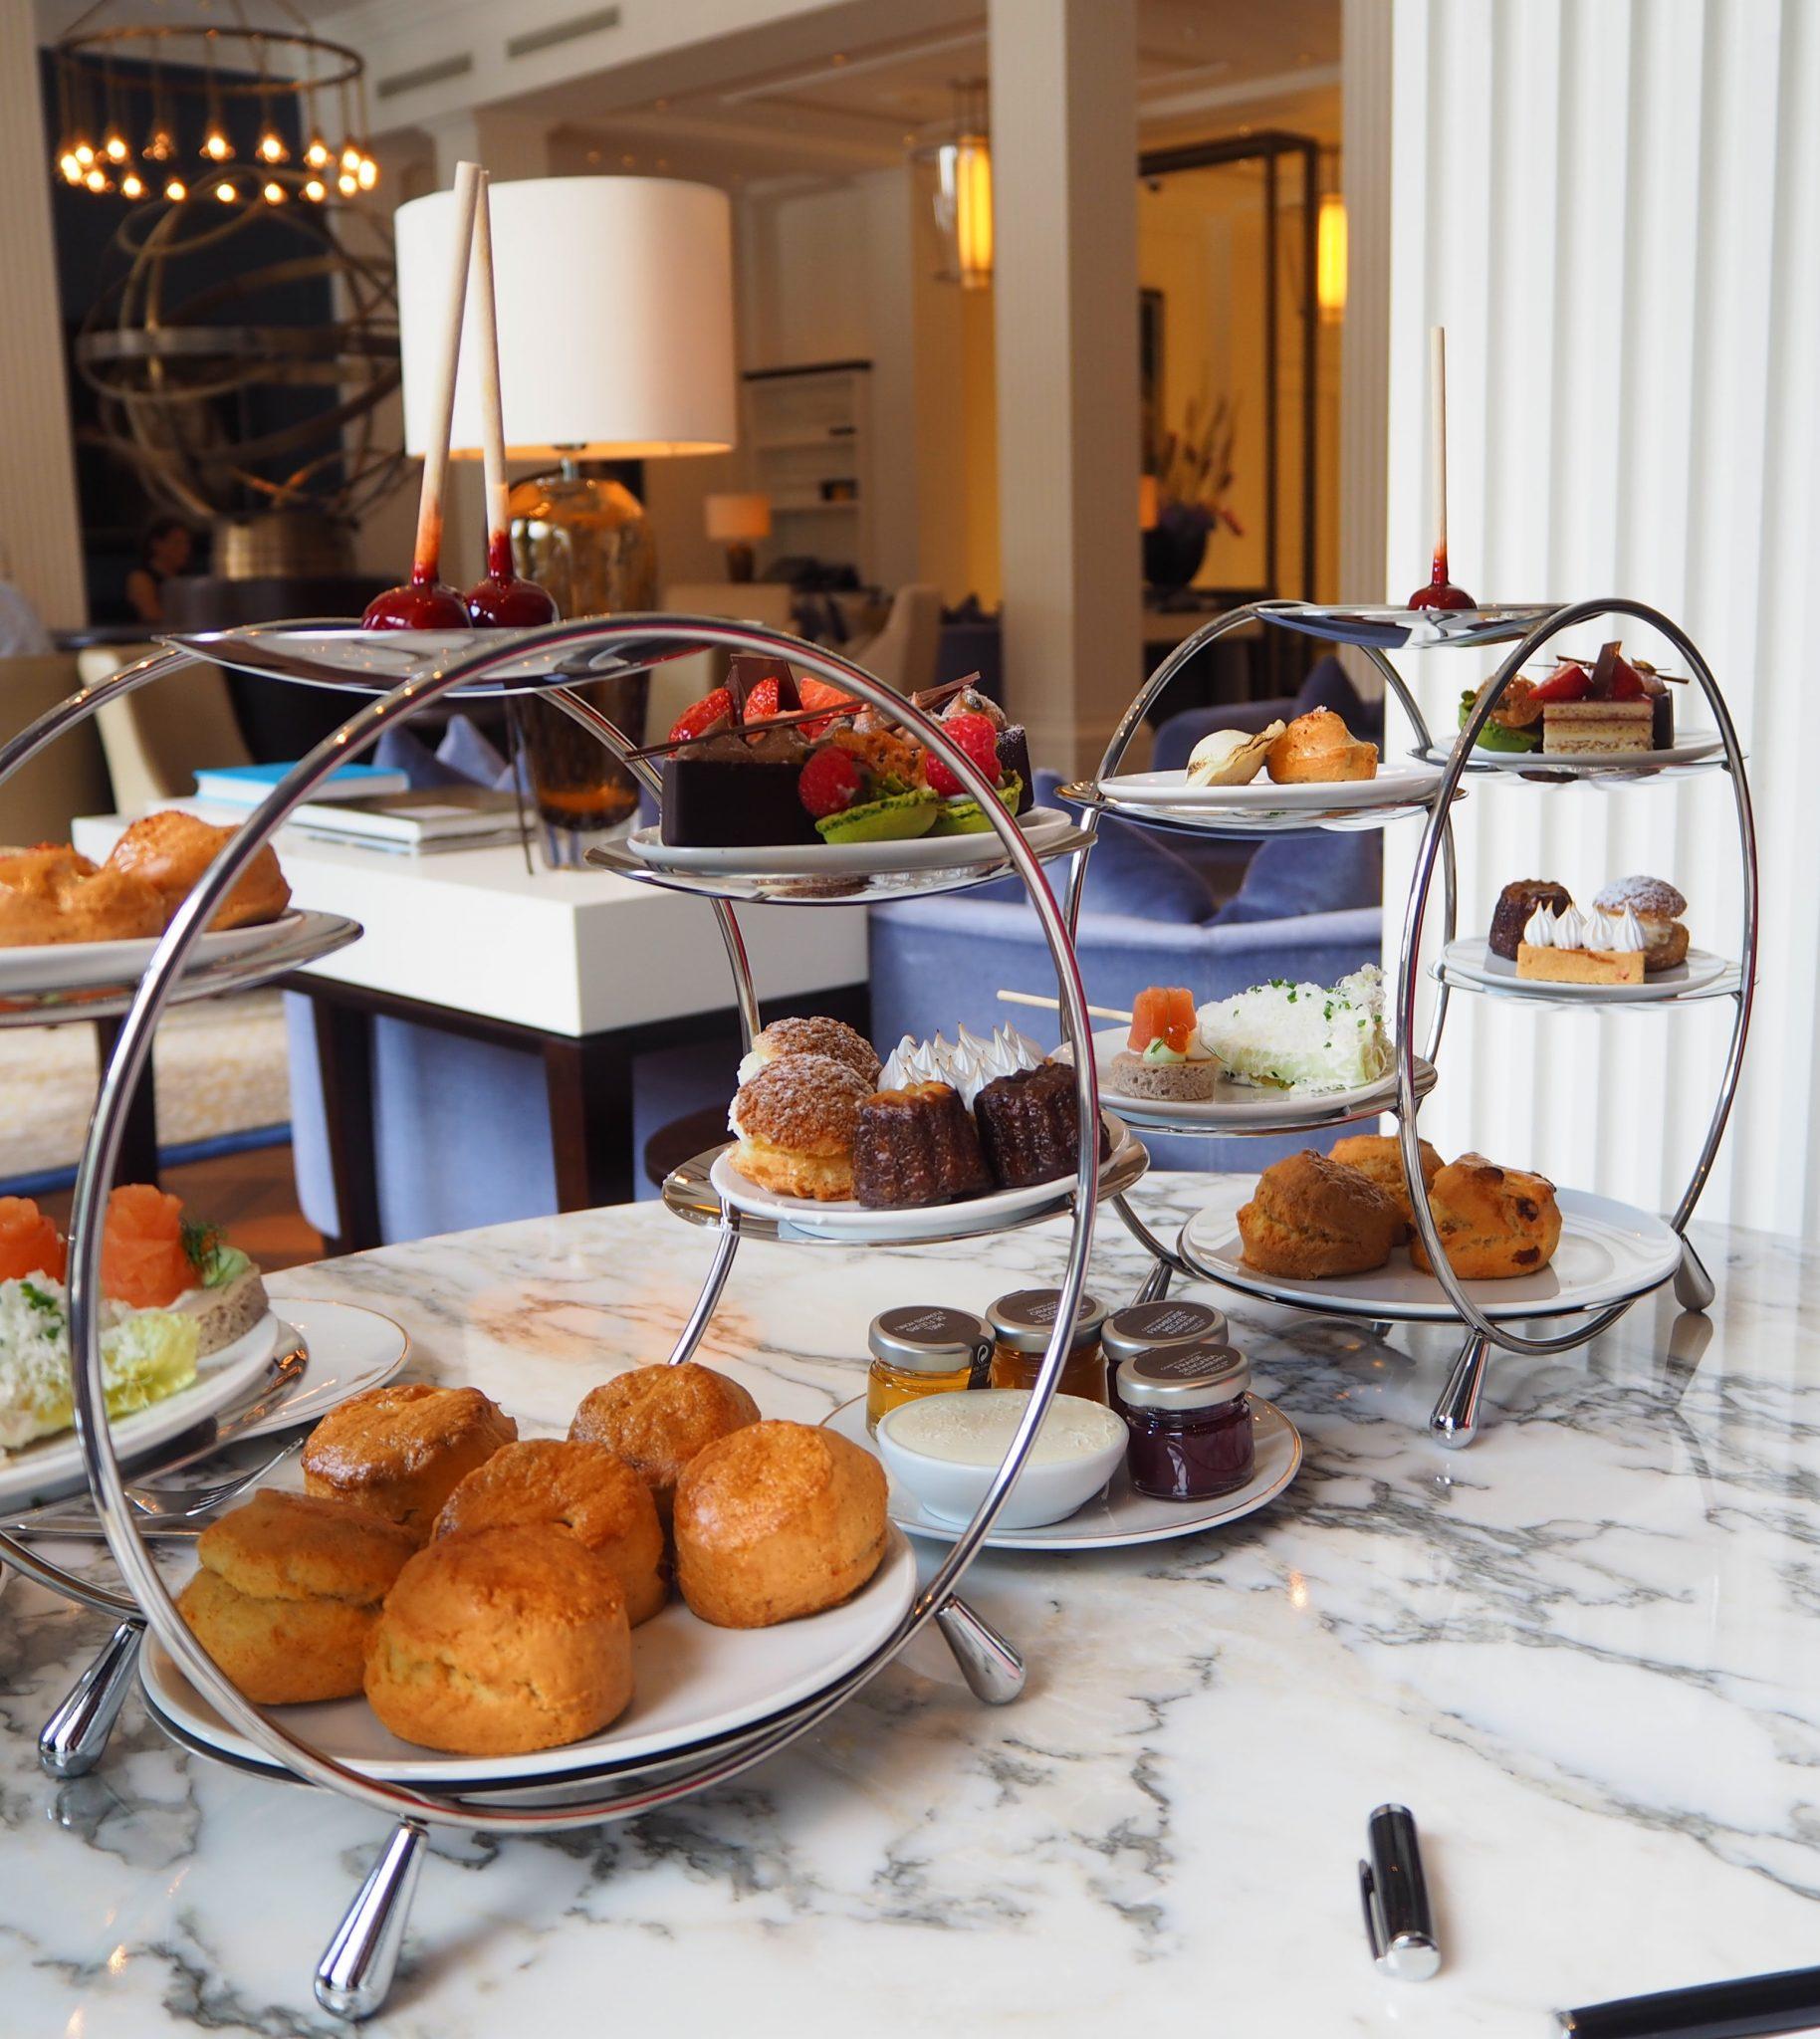 Afternoon Tea - The Waldorf Astoria Amsterdam